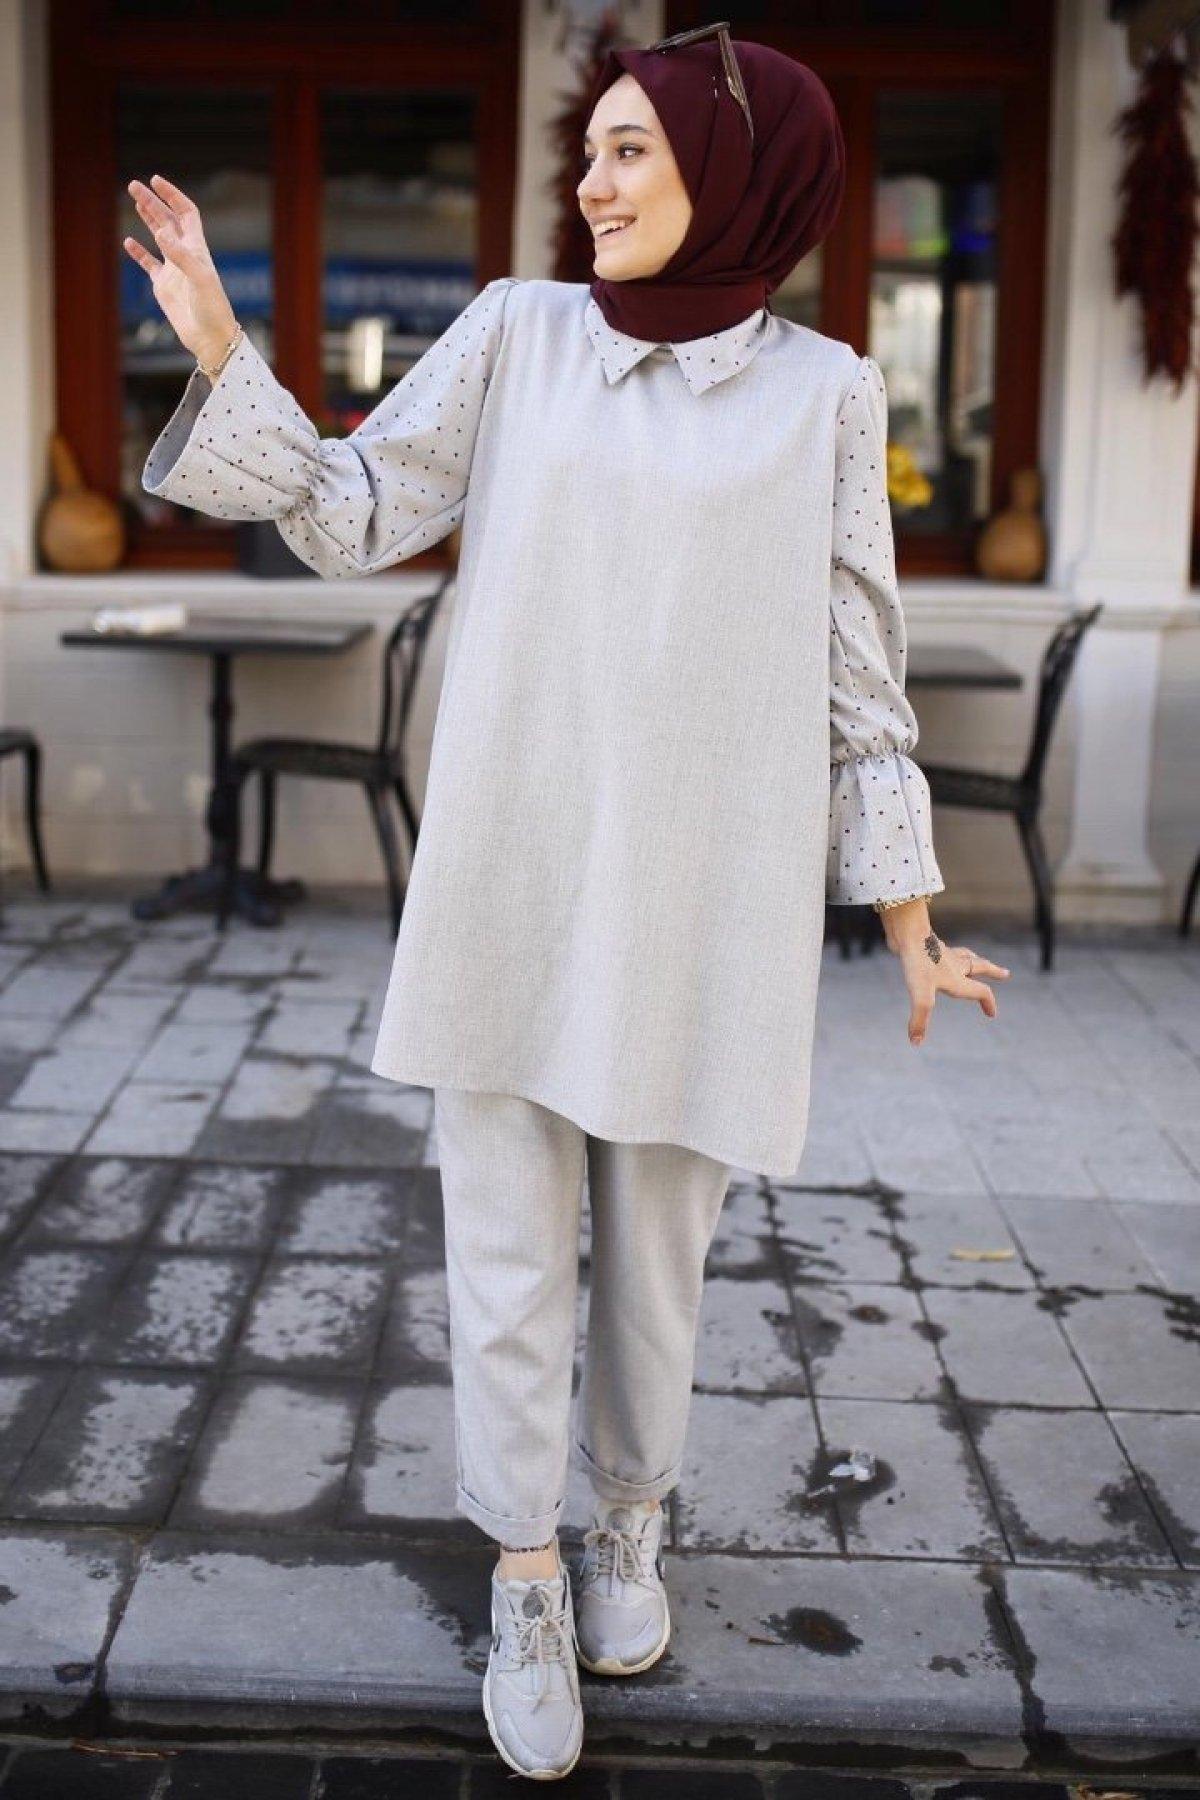 Muslim Abayas Suit Hijab Dress Grey 2 PIECES Bottom Top Fashion 4 Season Islamic Clothing Caftan Ramadan Dubai Made in Turkey